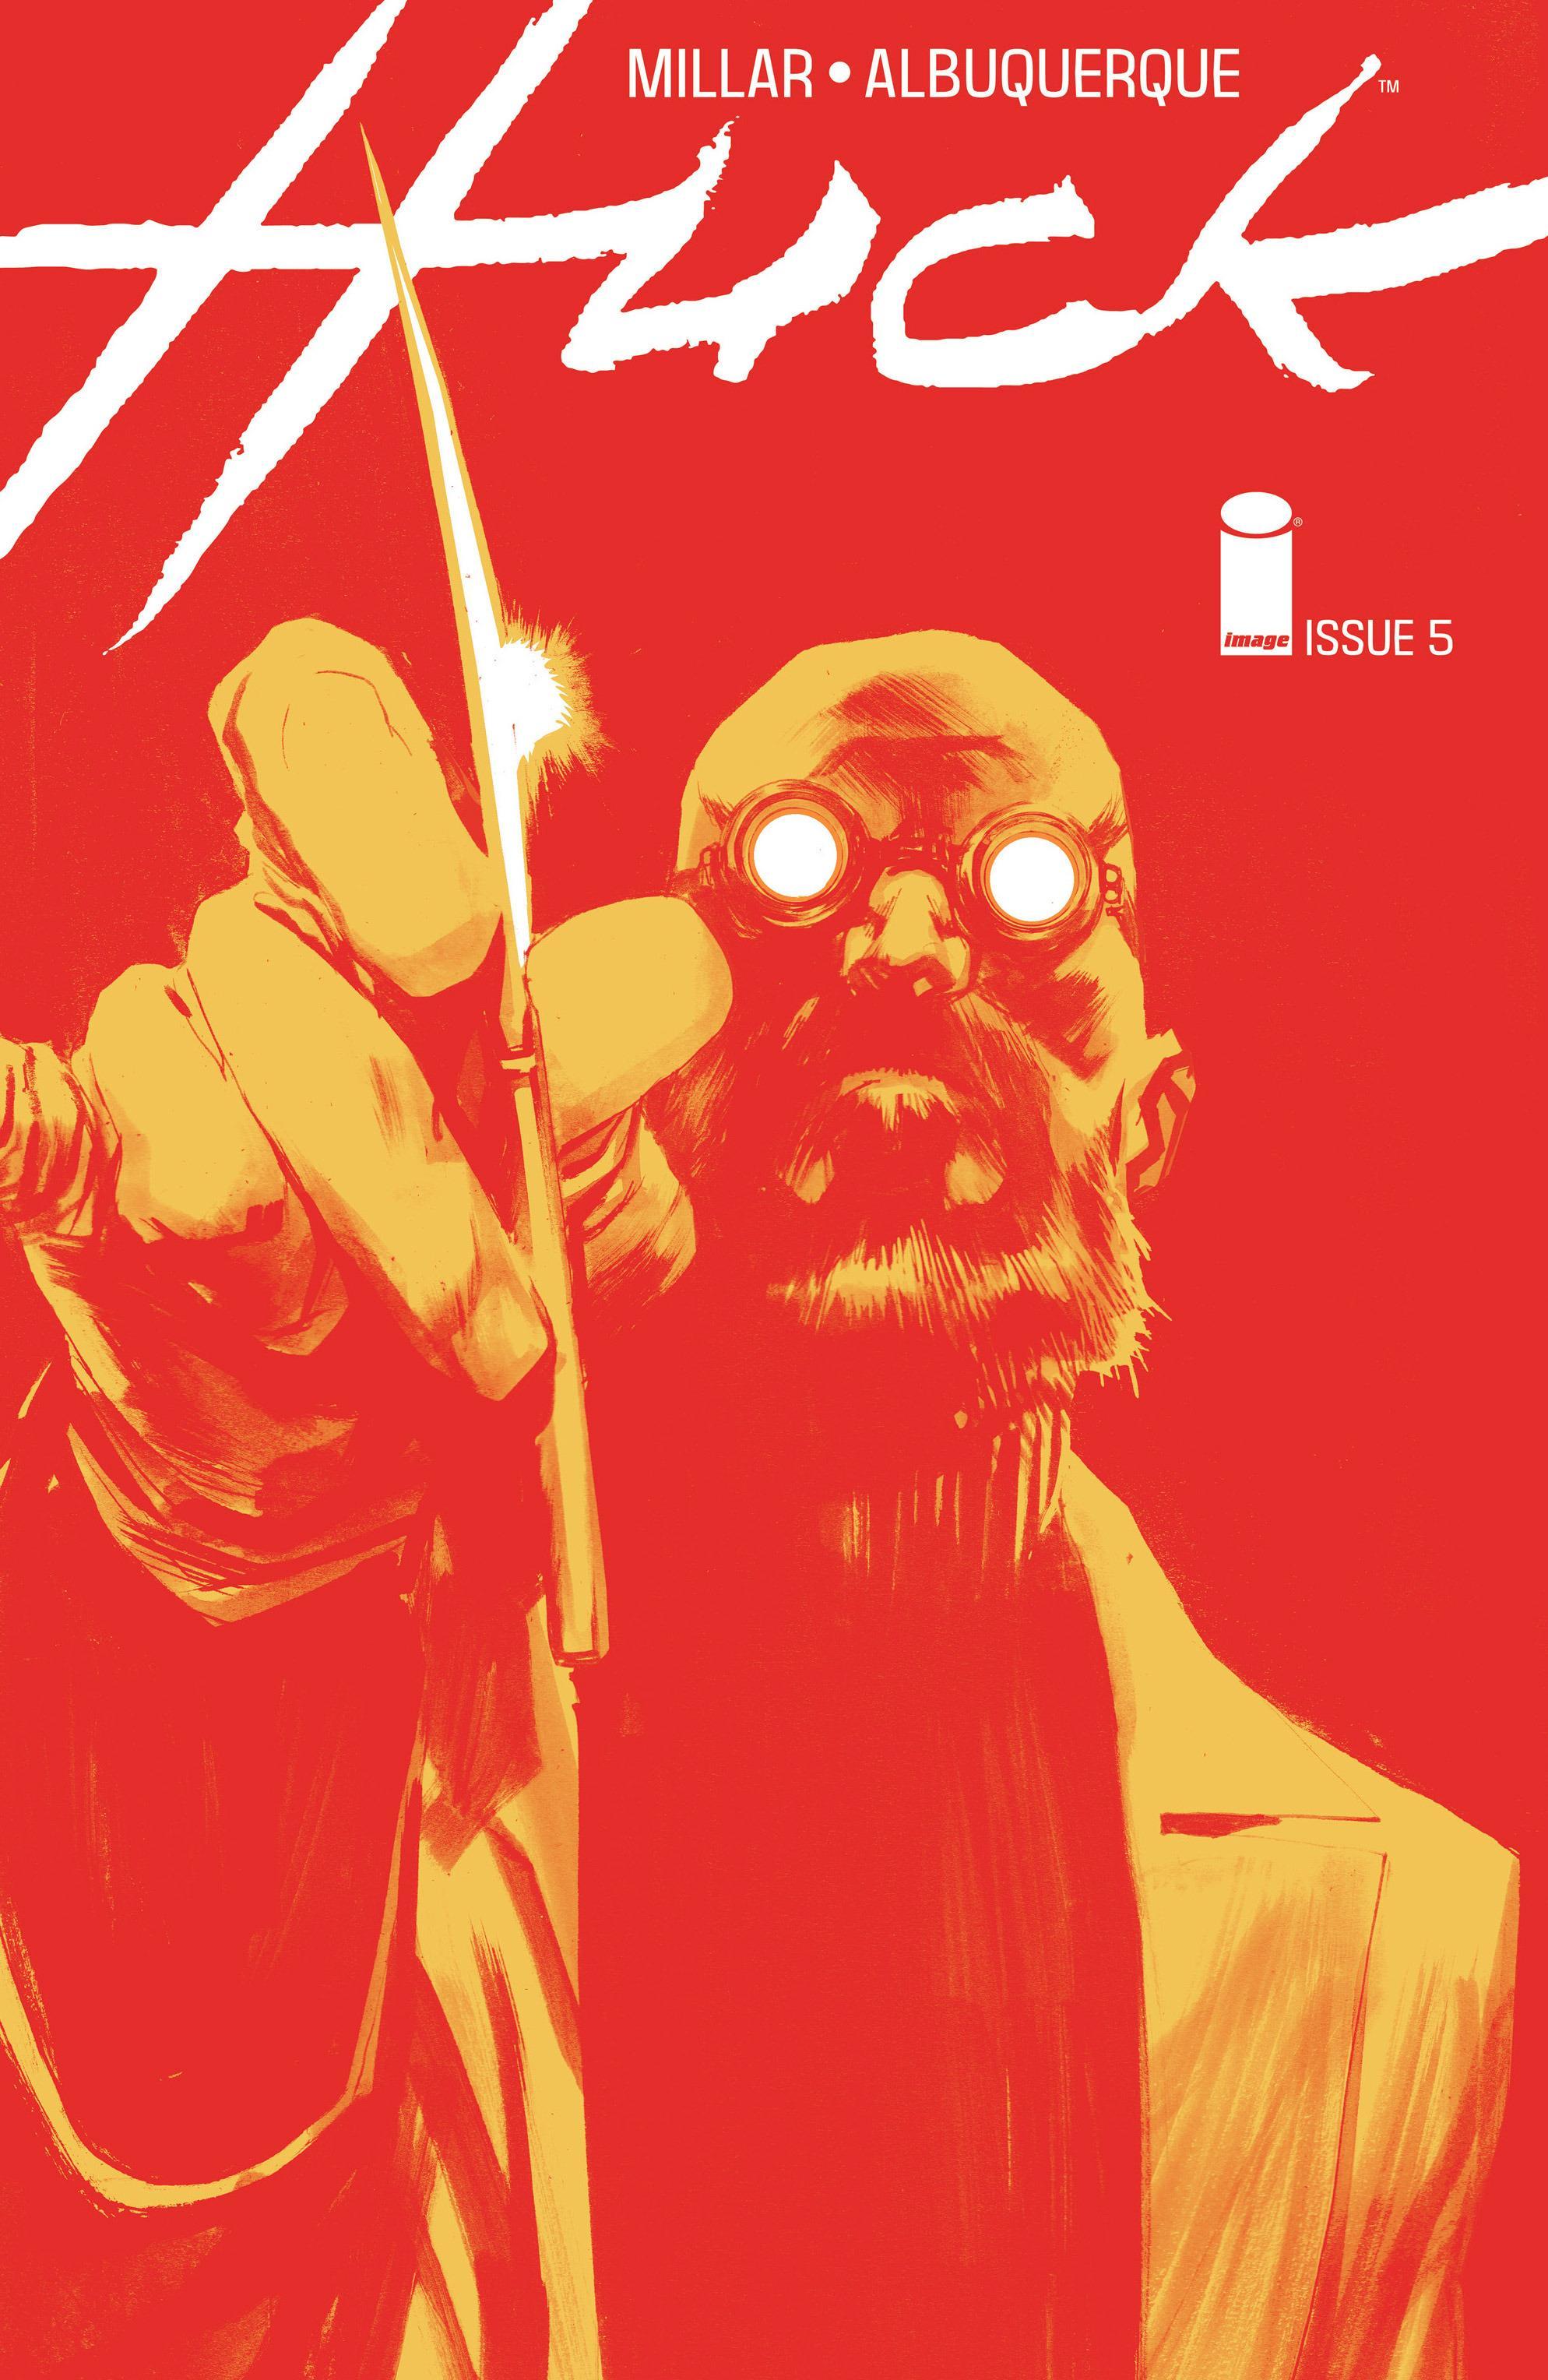 COMIC REVIEW: Huck #5 - Orlov's Big Day